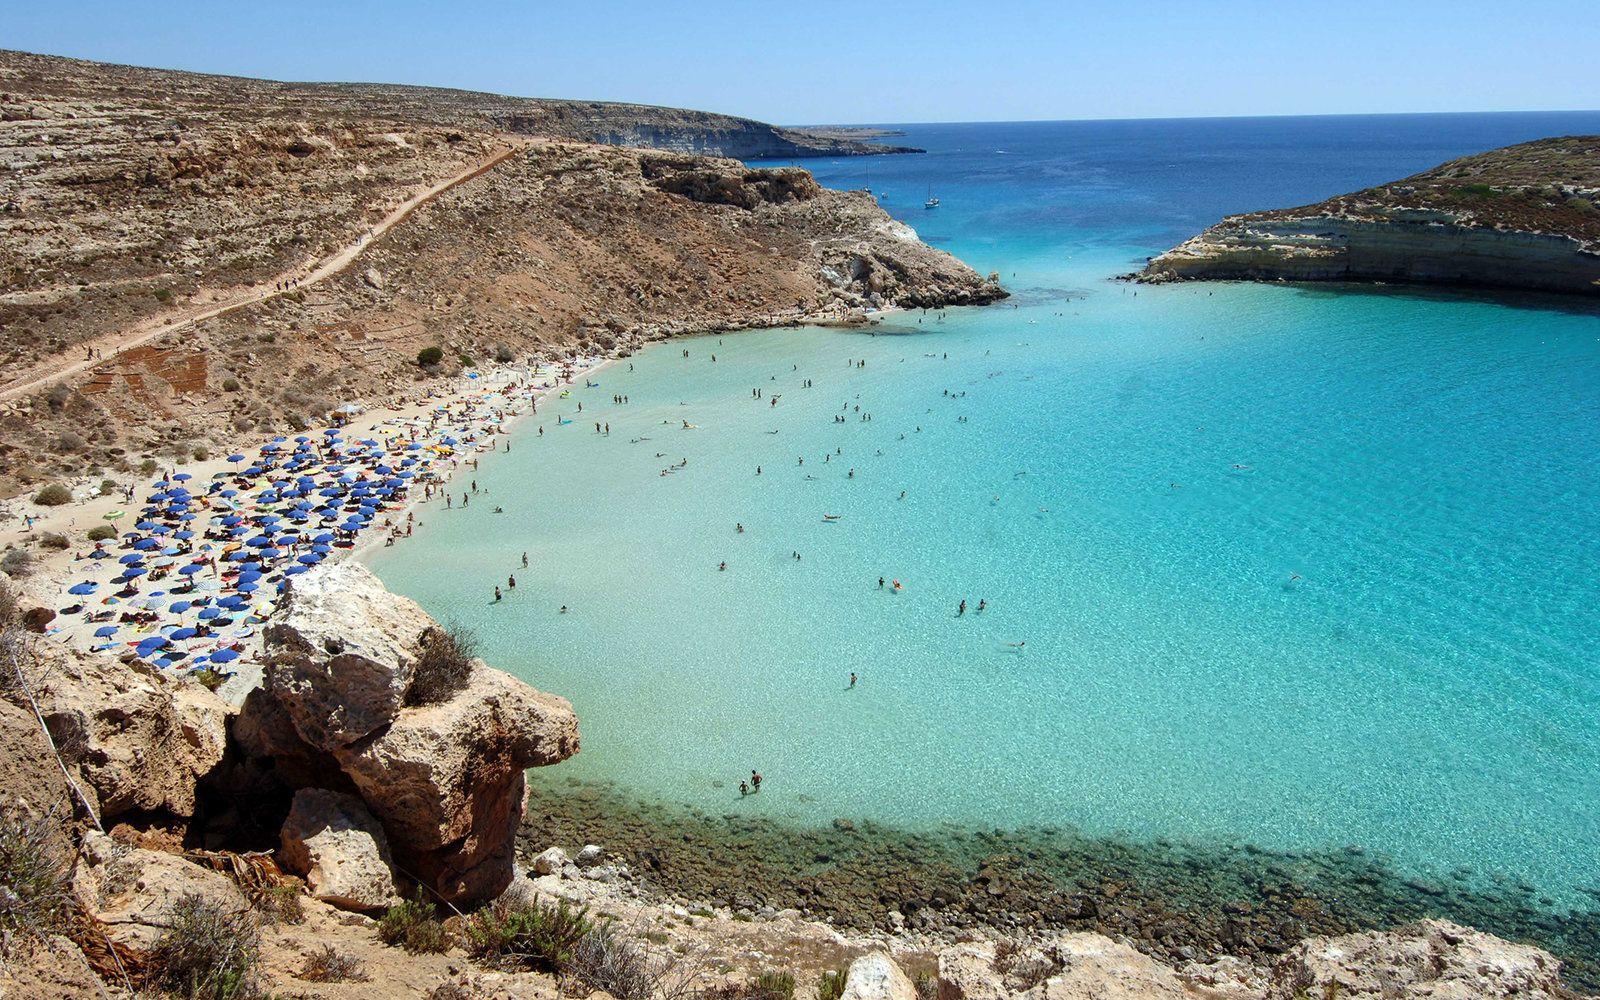 Europe S Best Beaches Best Beaches In Europe Beaches In The World Cheap Beach Vacations